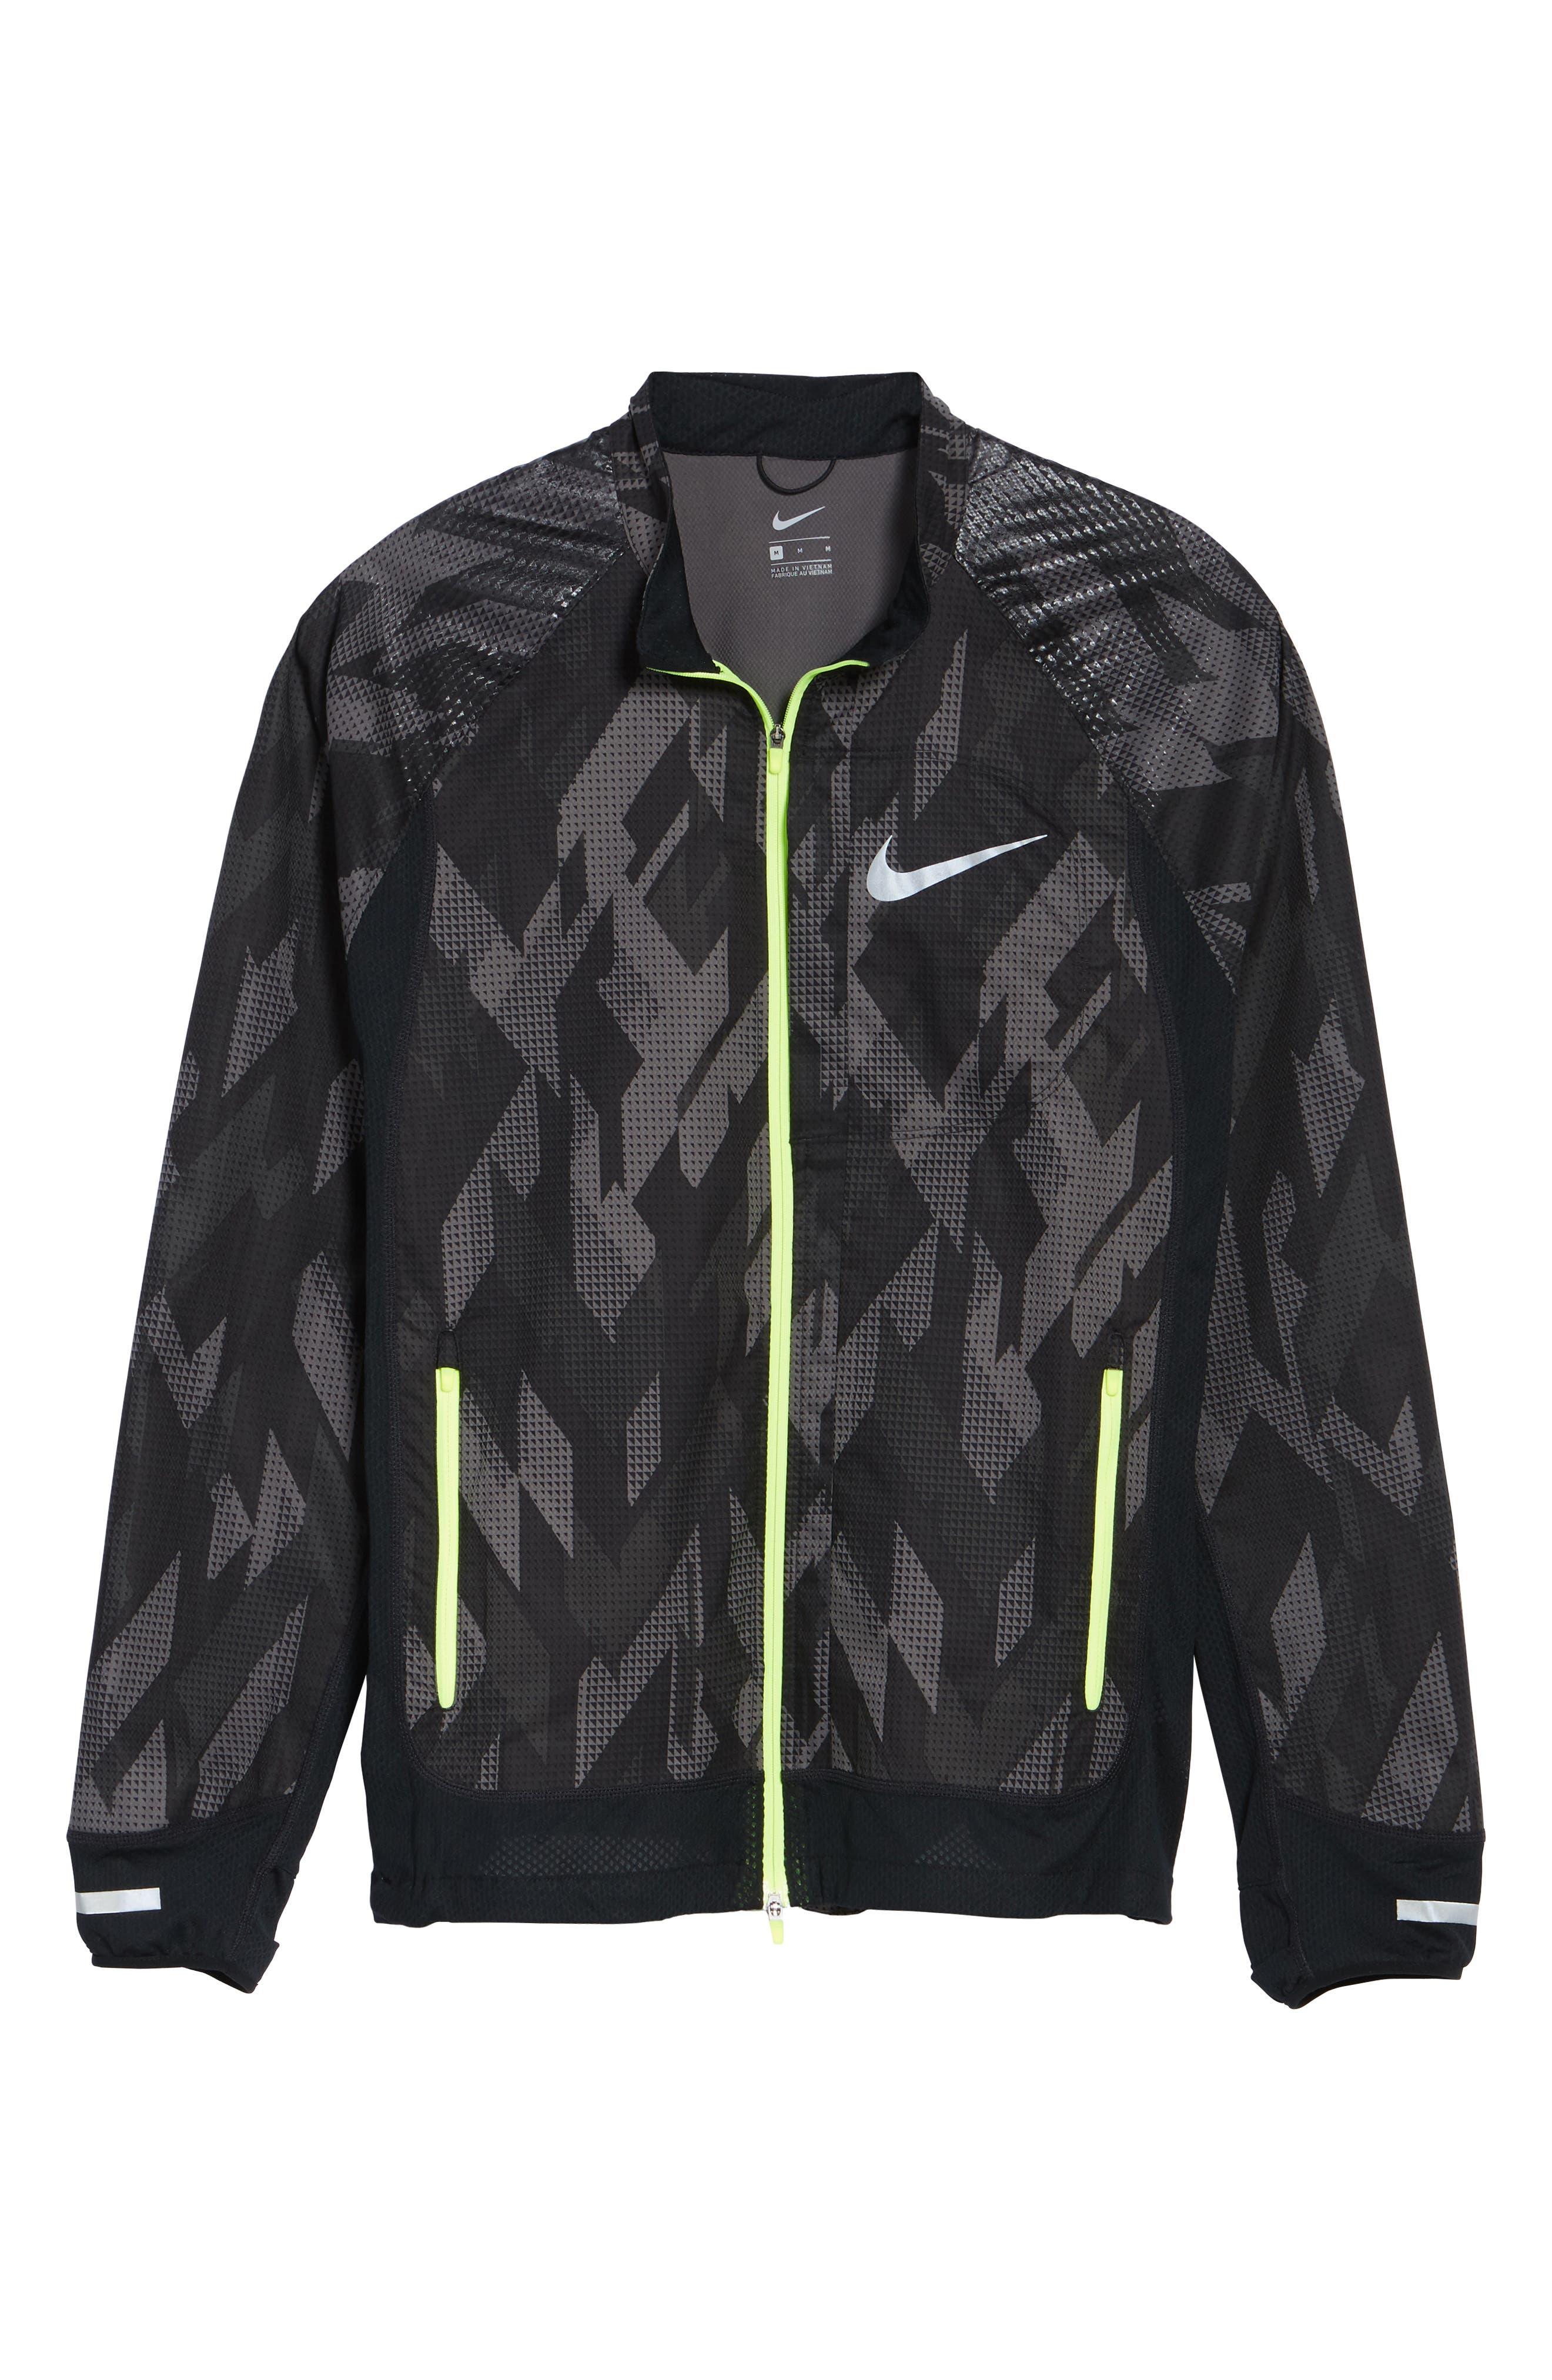 Flex Running Jacket,                             Alternate thumbnail 4, color,                             Black/ Black/ Volt